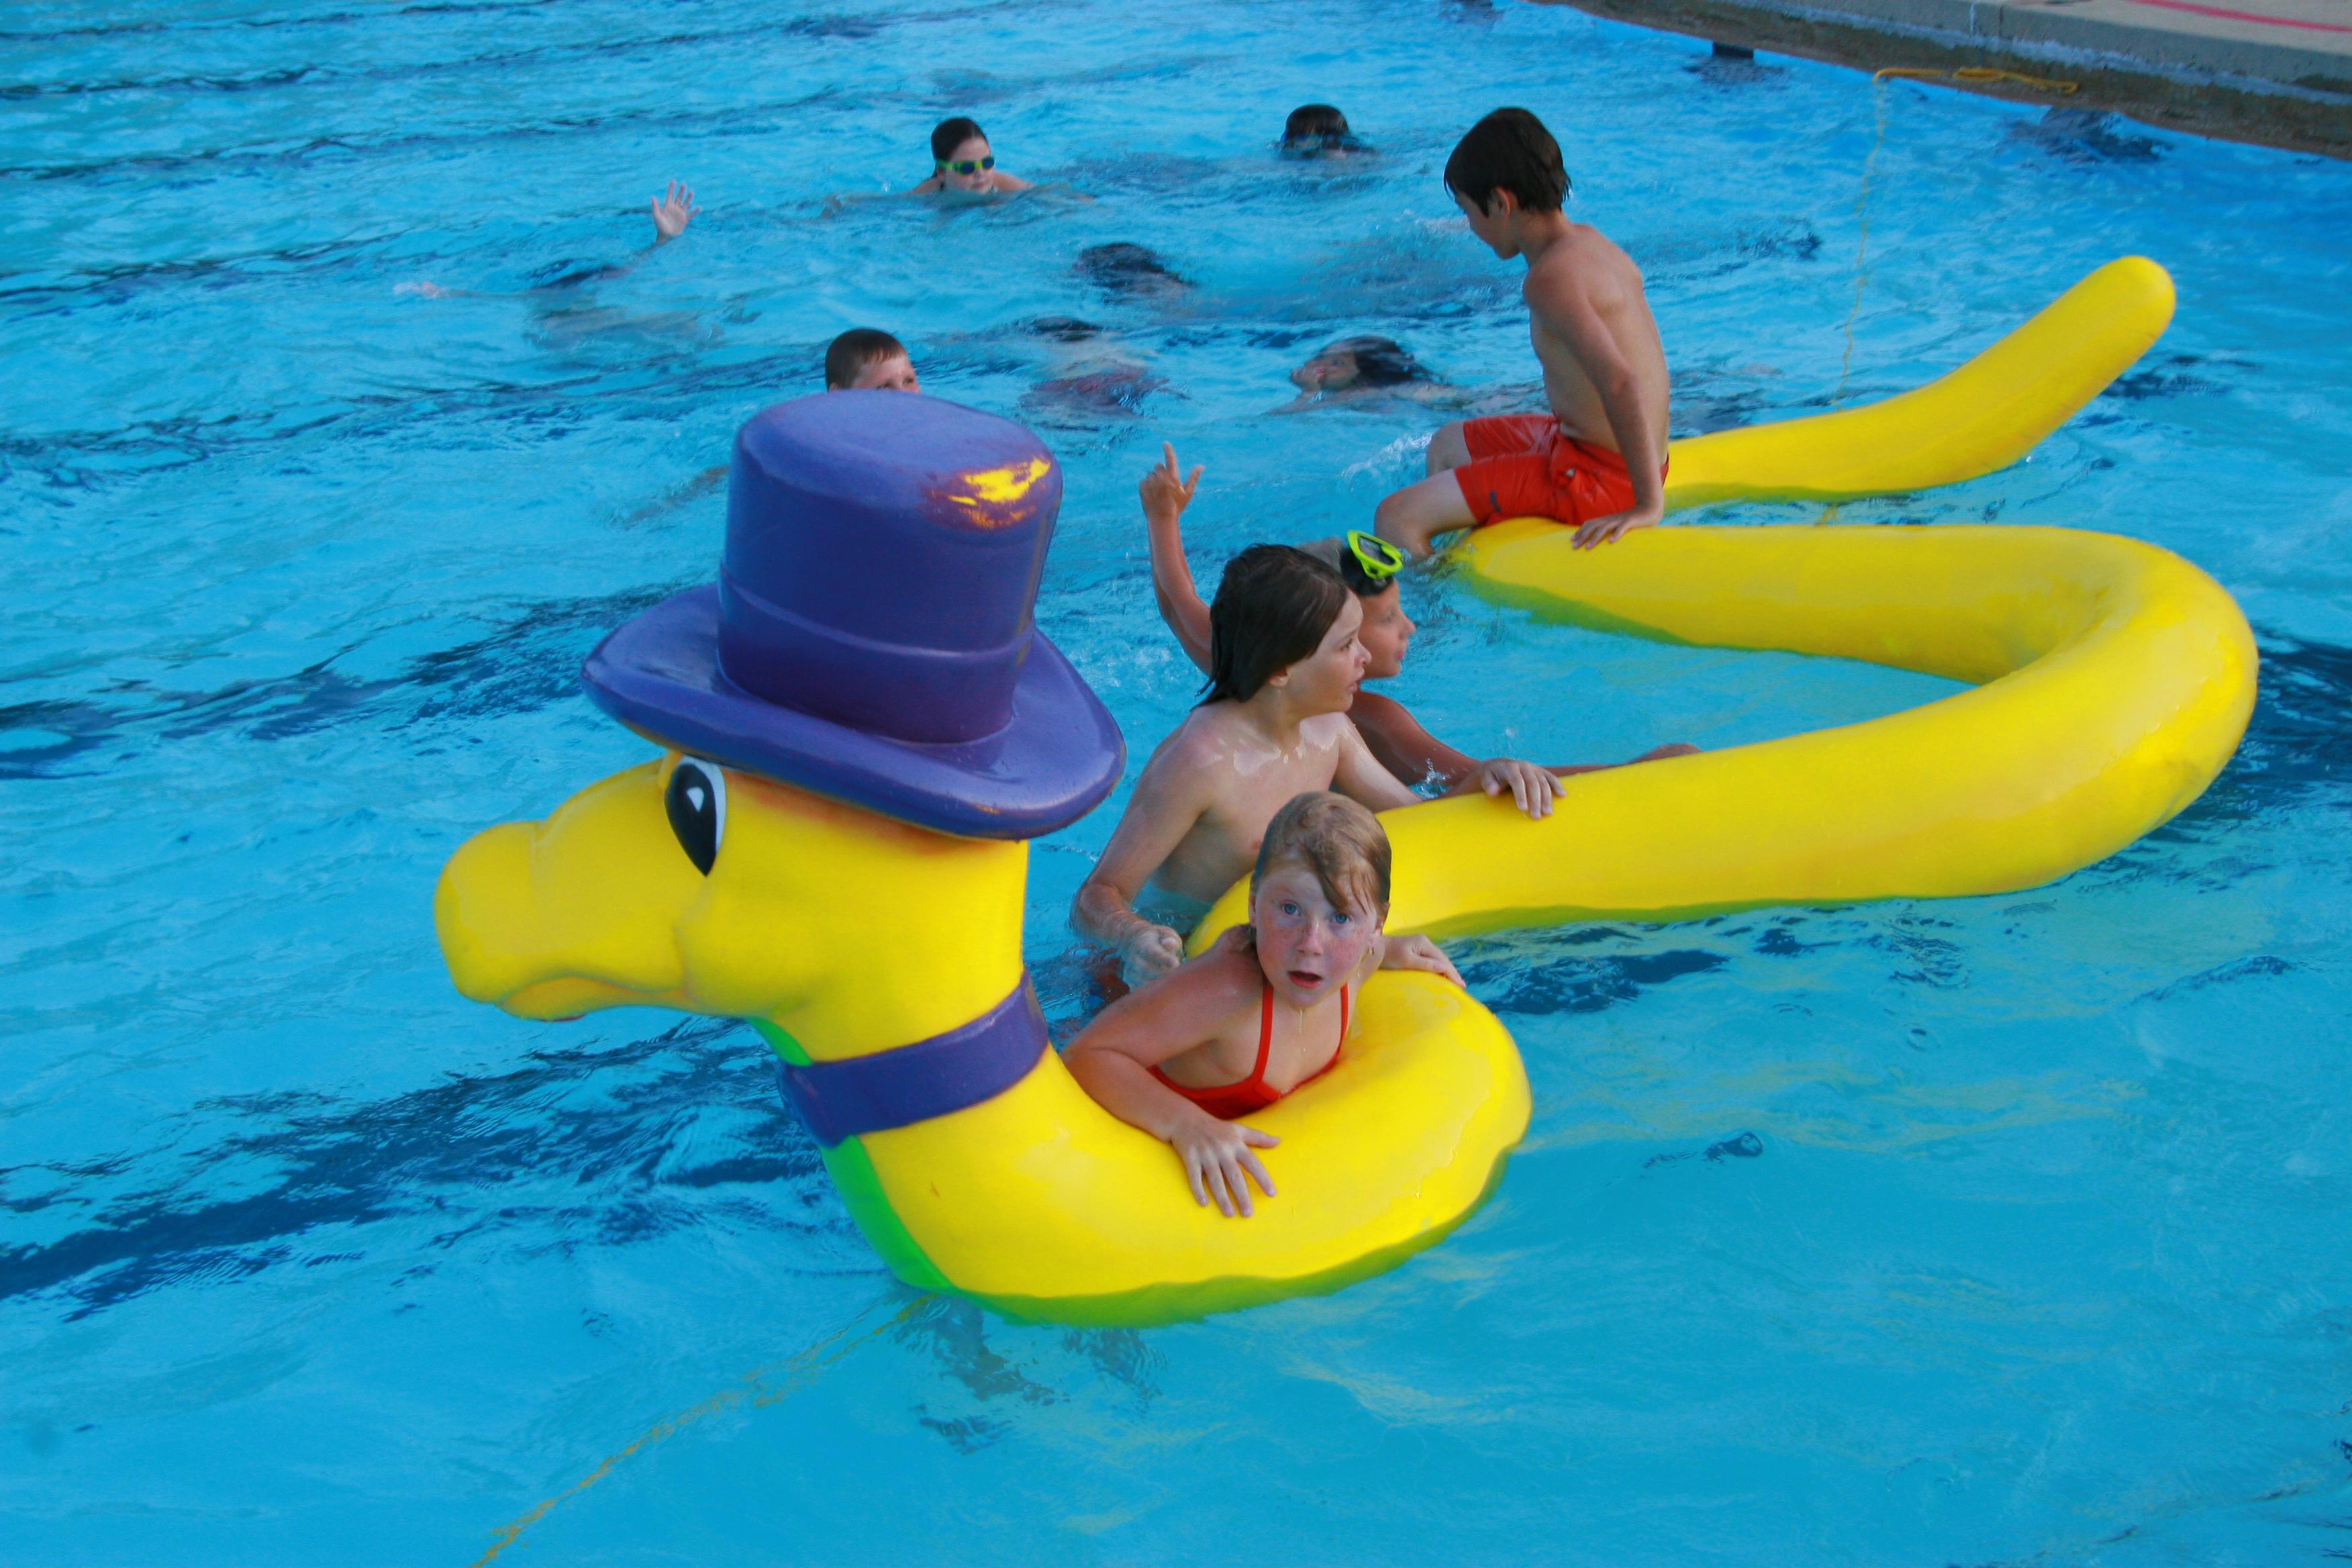 Frank Olson Pool City Of Sioux Falls